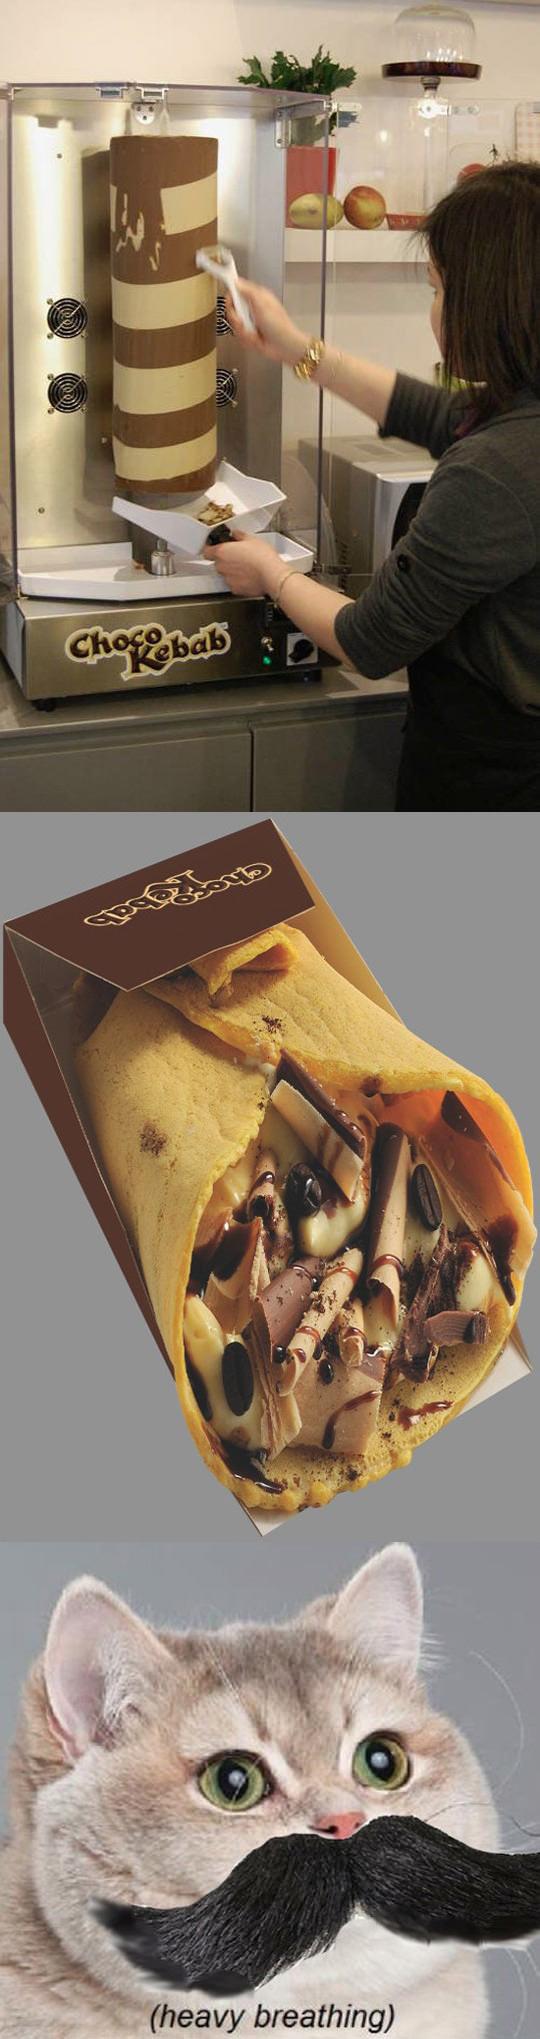 Chocolate Kebab